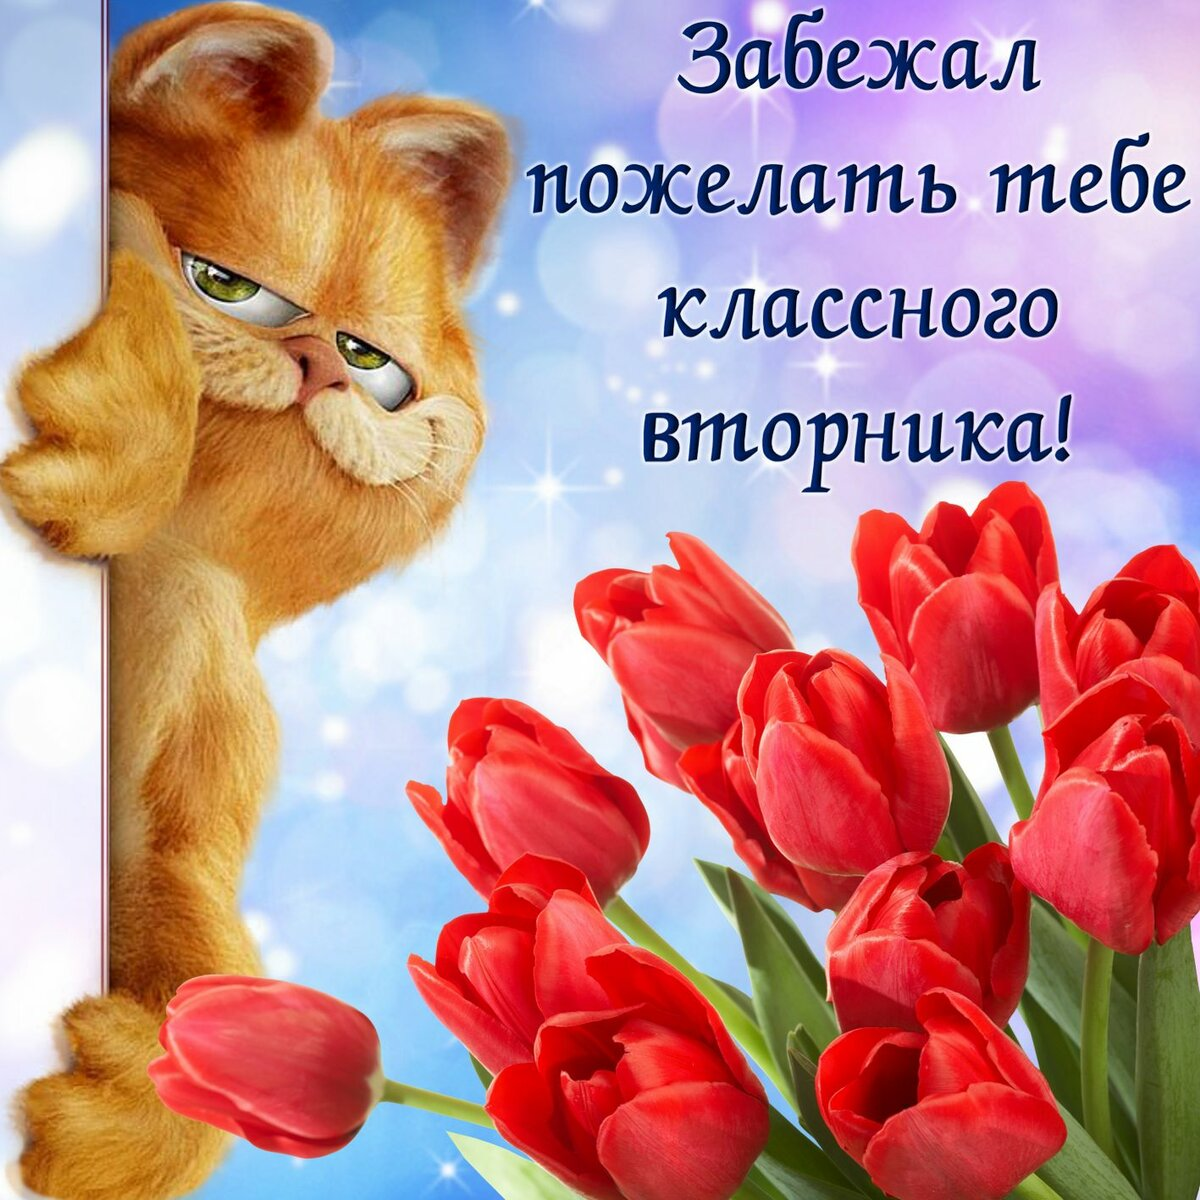 Картинка удачного вторника с приколом, картинки женщина кошка